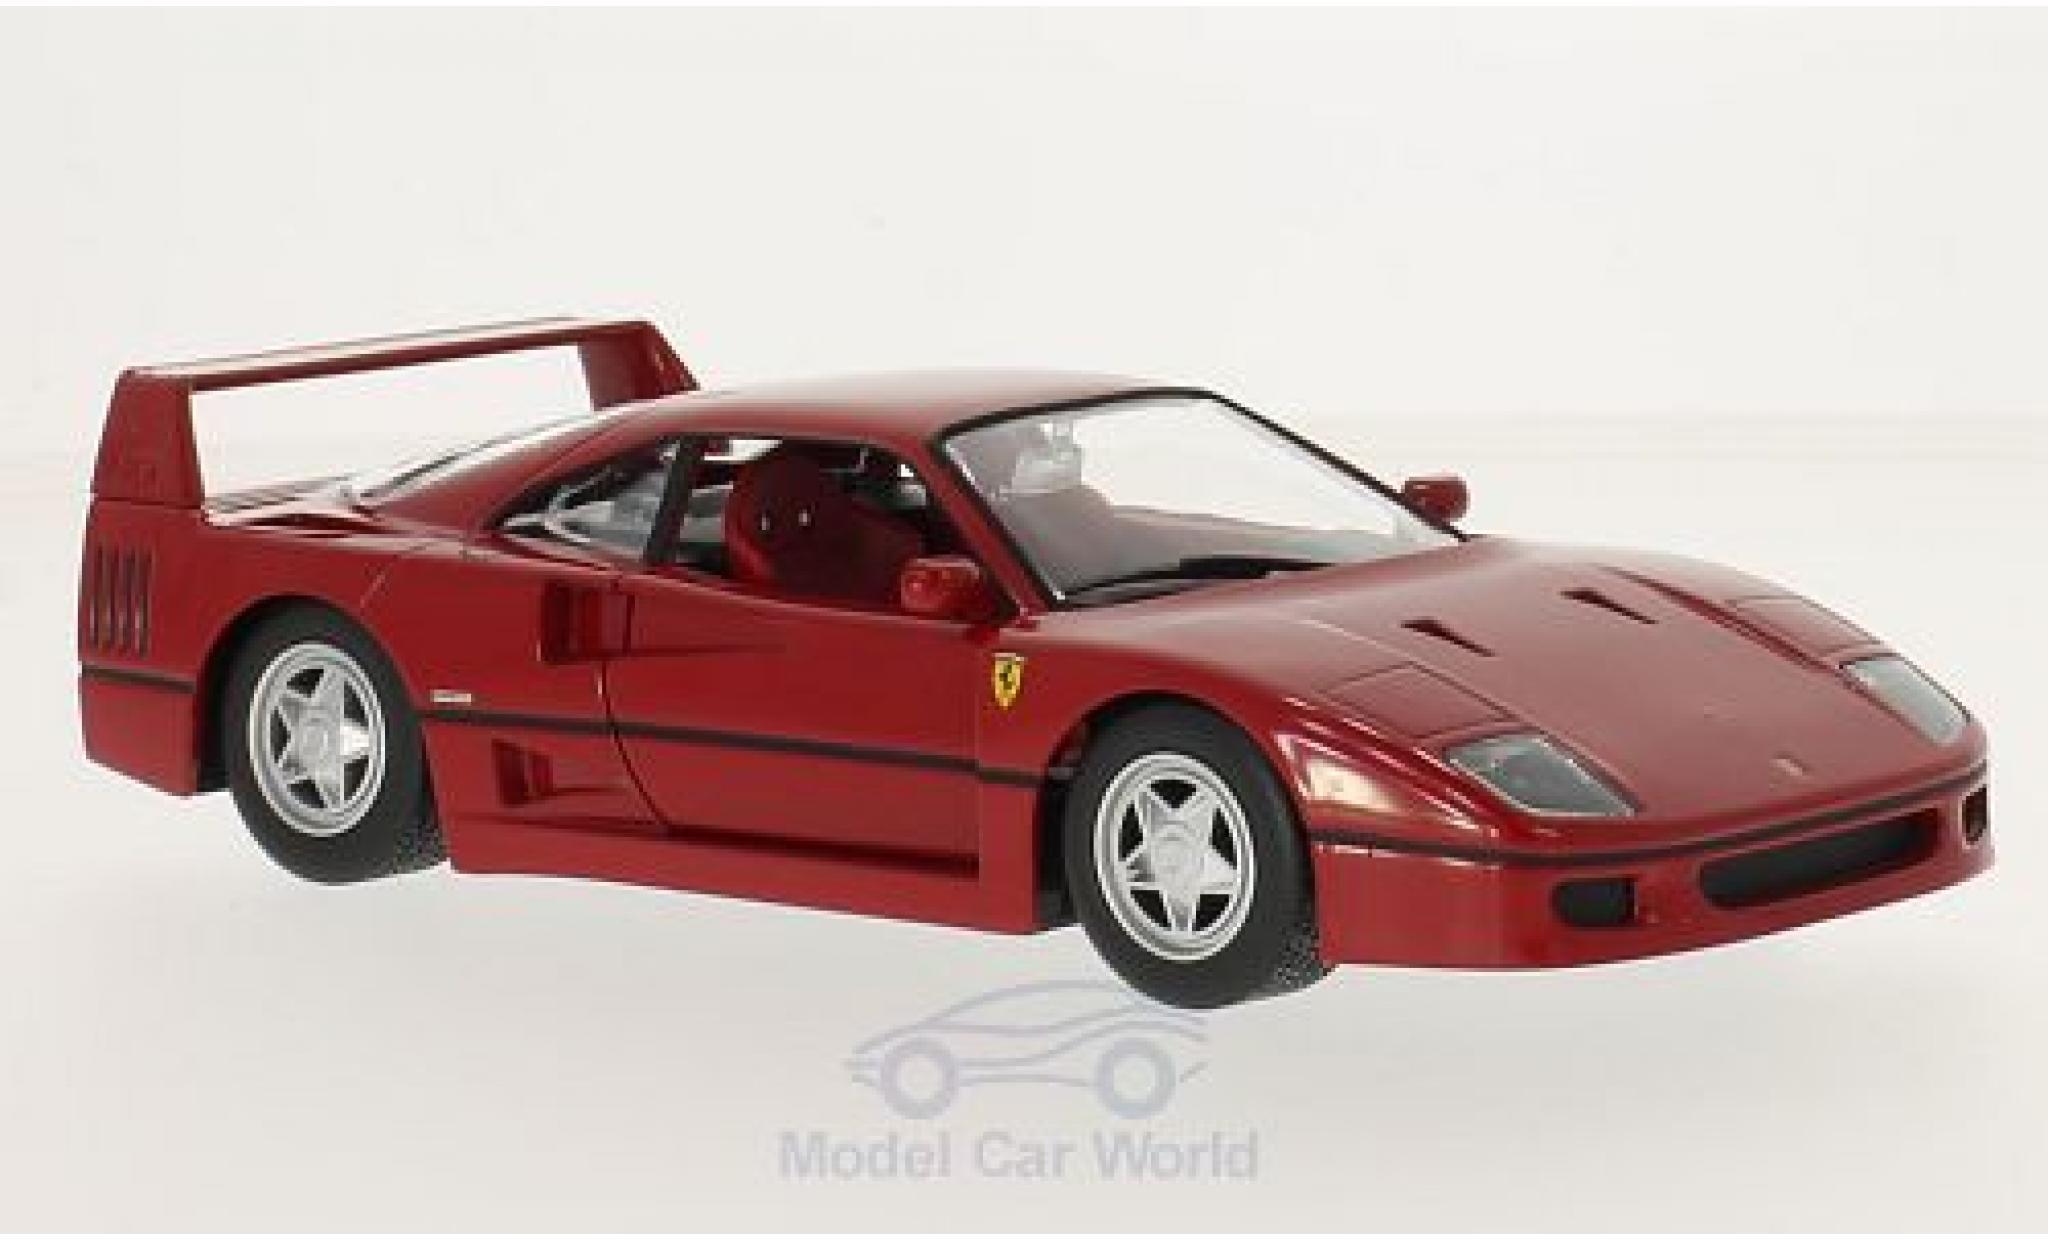 Ferrari F40 1/24 Bburago red